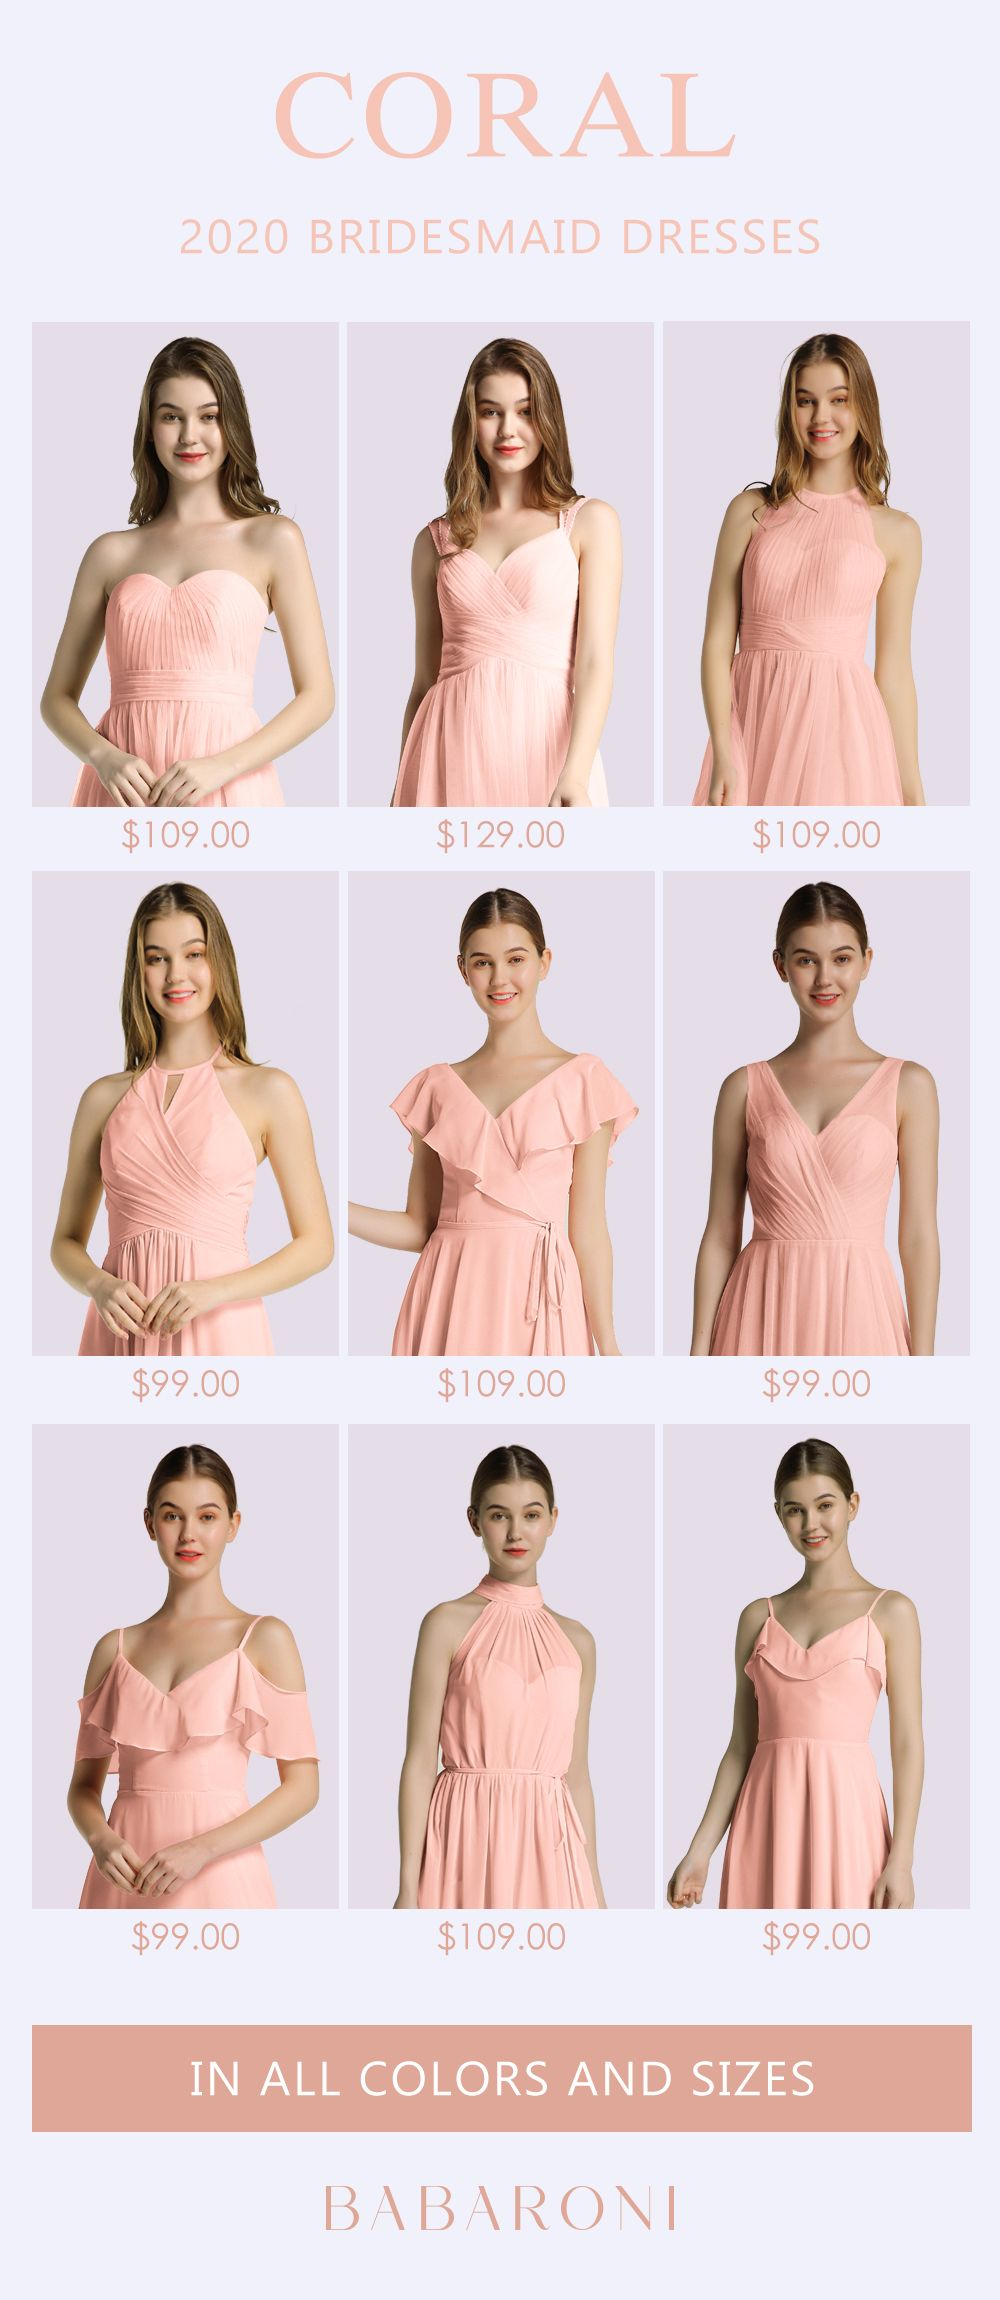 Bridesmaid Dresses In 2020 Coral Colored Bridesmaid Dresses Bridesmaid Dress Collection Bridesmaid Dresses